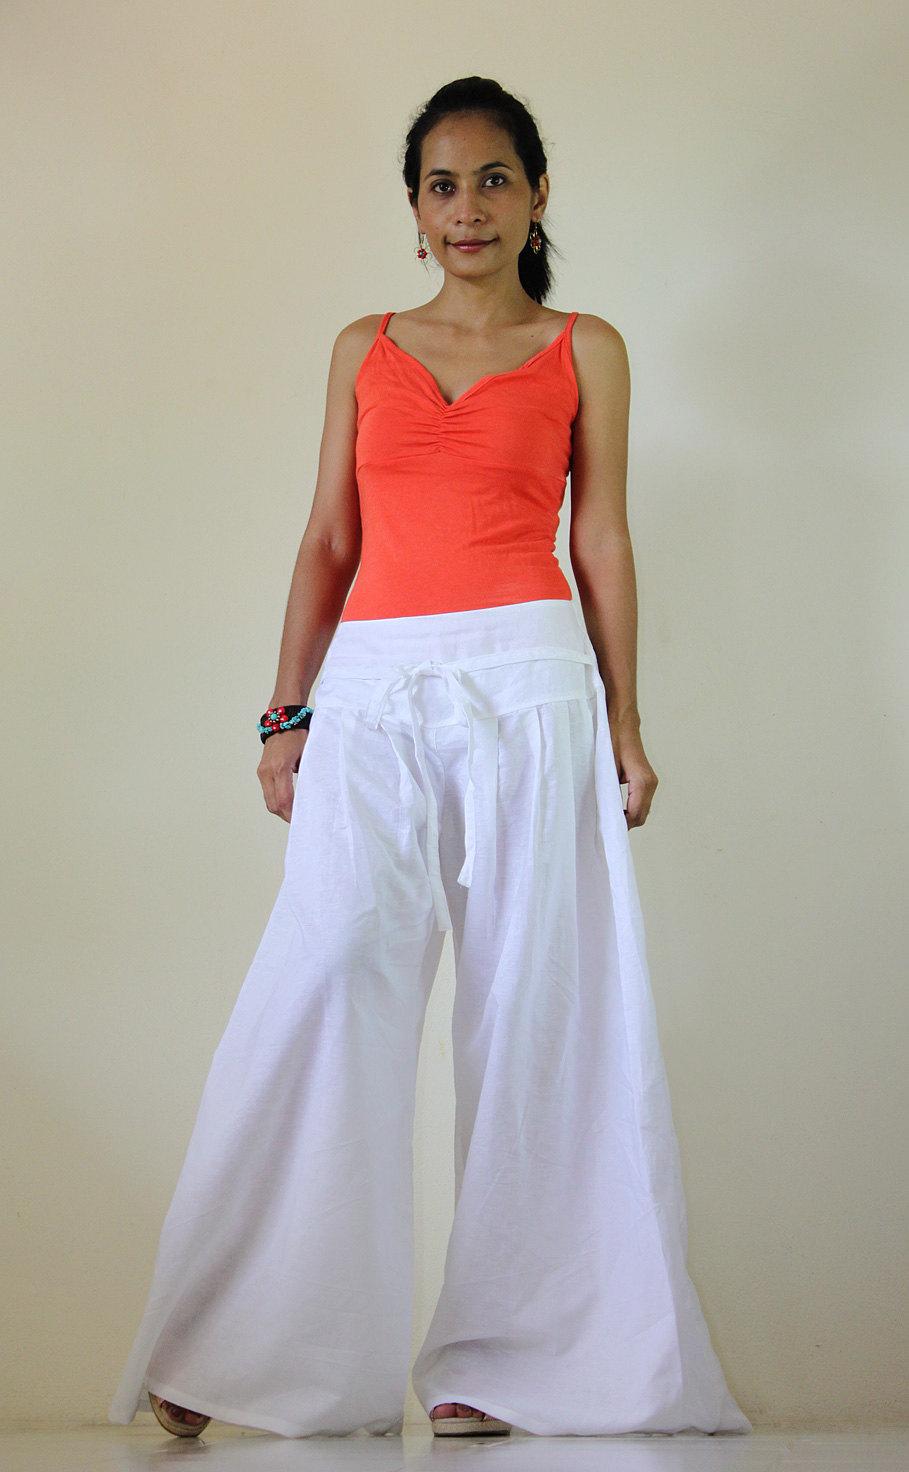 White Pants - Wide Leg Pants Cotton Linen Casual Wear : Soul Of ...